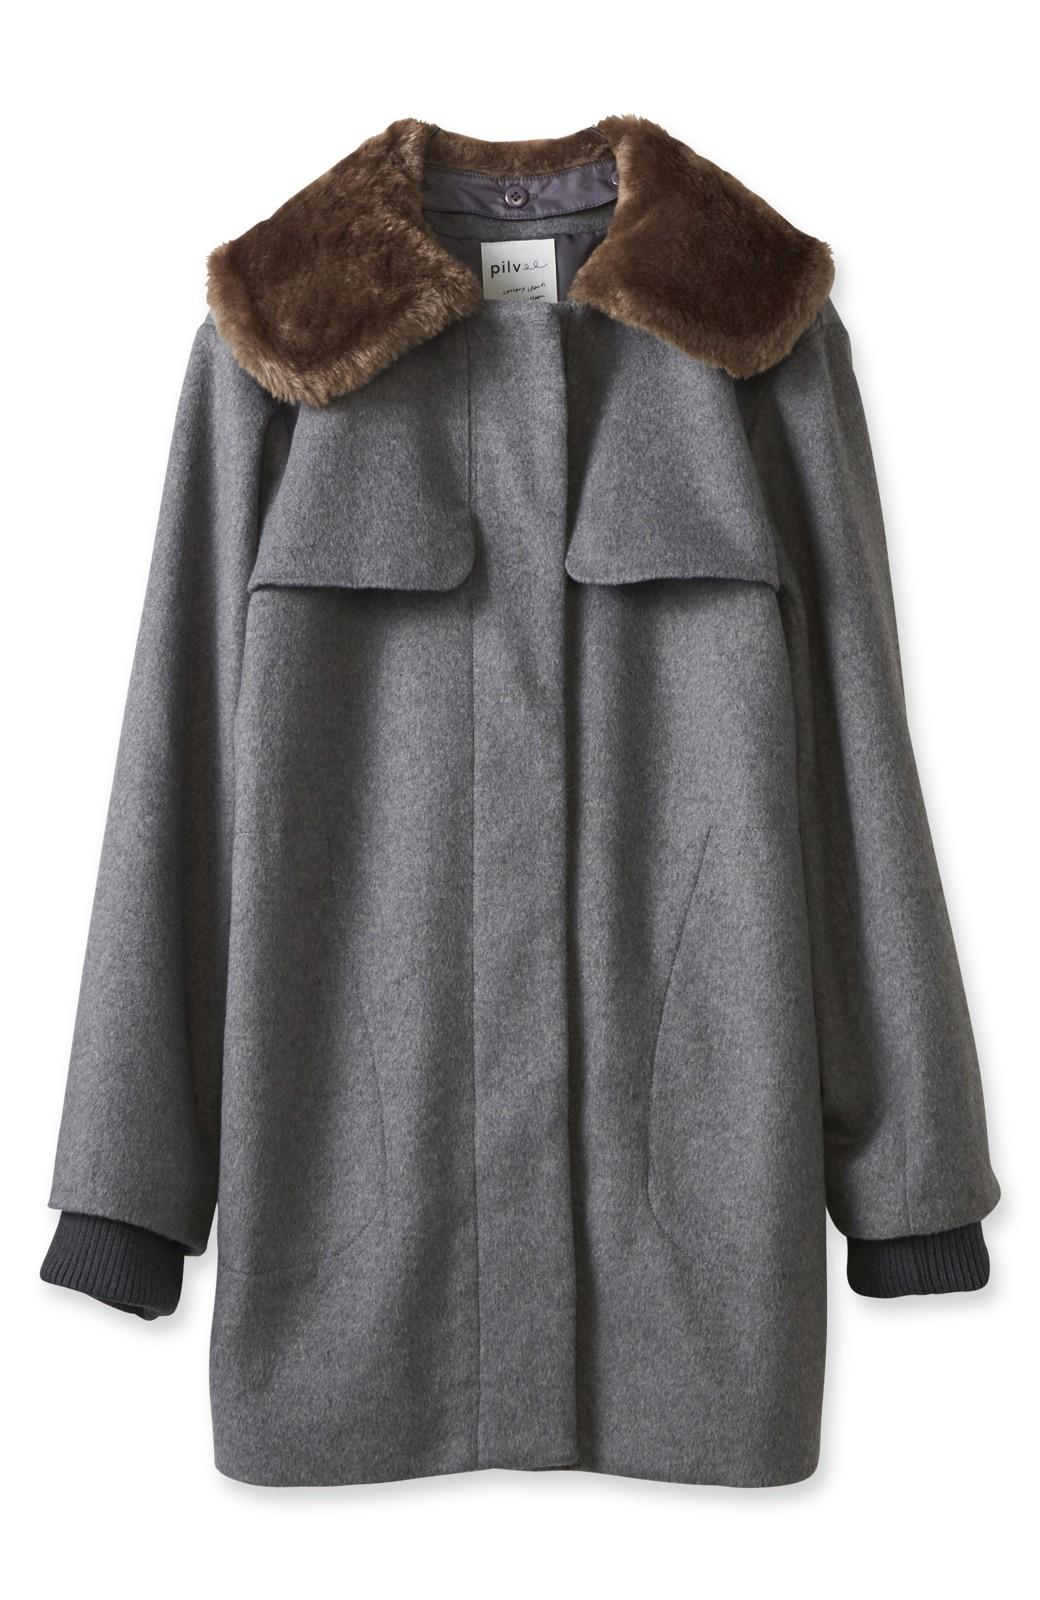 pilvee 取り外しフェイクファー衿付き ウール混のノーカラーコート <グレー>の商品写真1